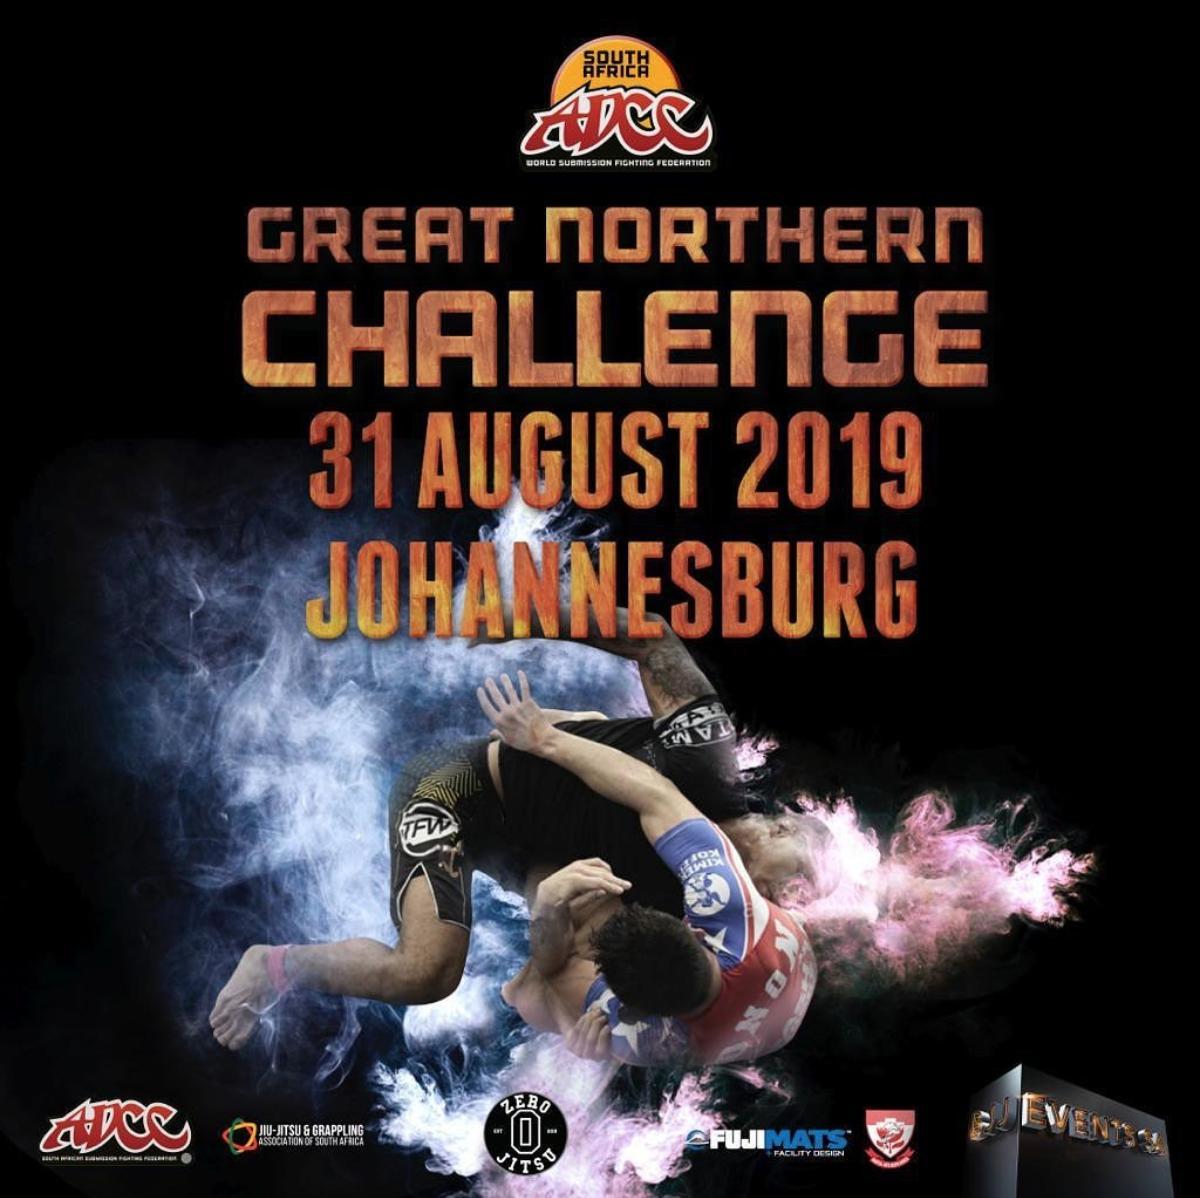 BJJ Events SA (@BJJEventsSA) | Twitter